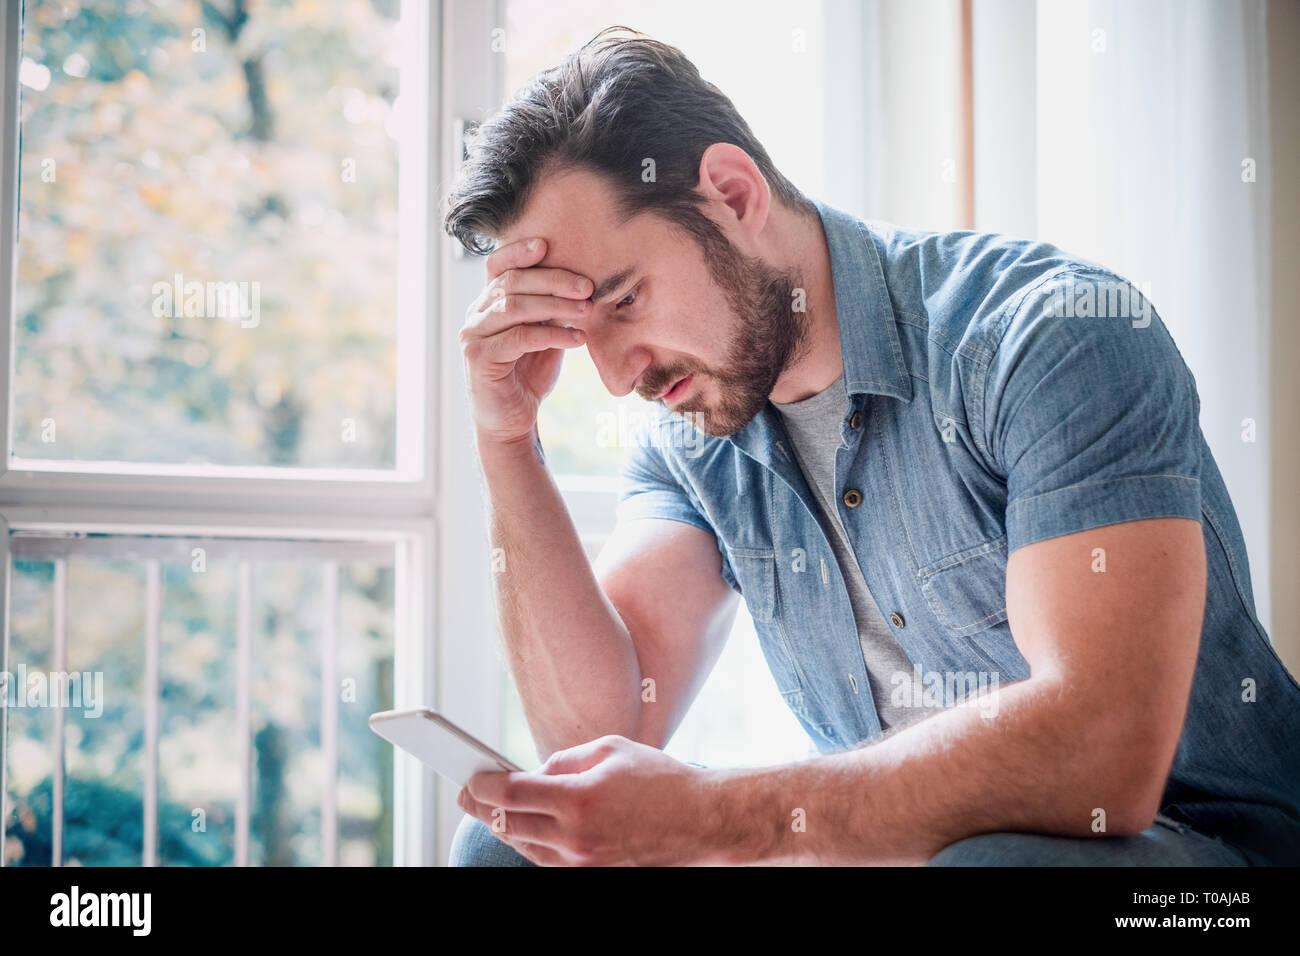 Sad man holding phone alone at home - Stock Image